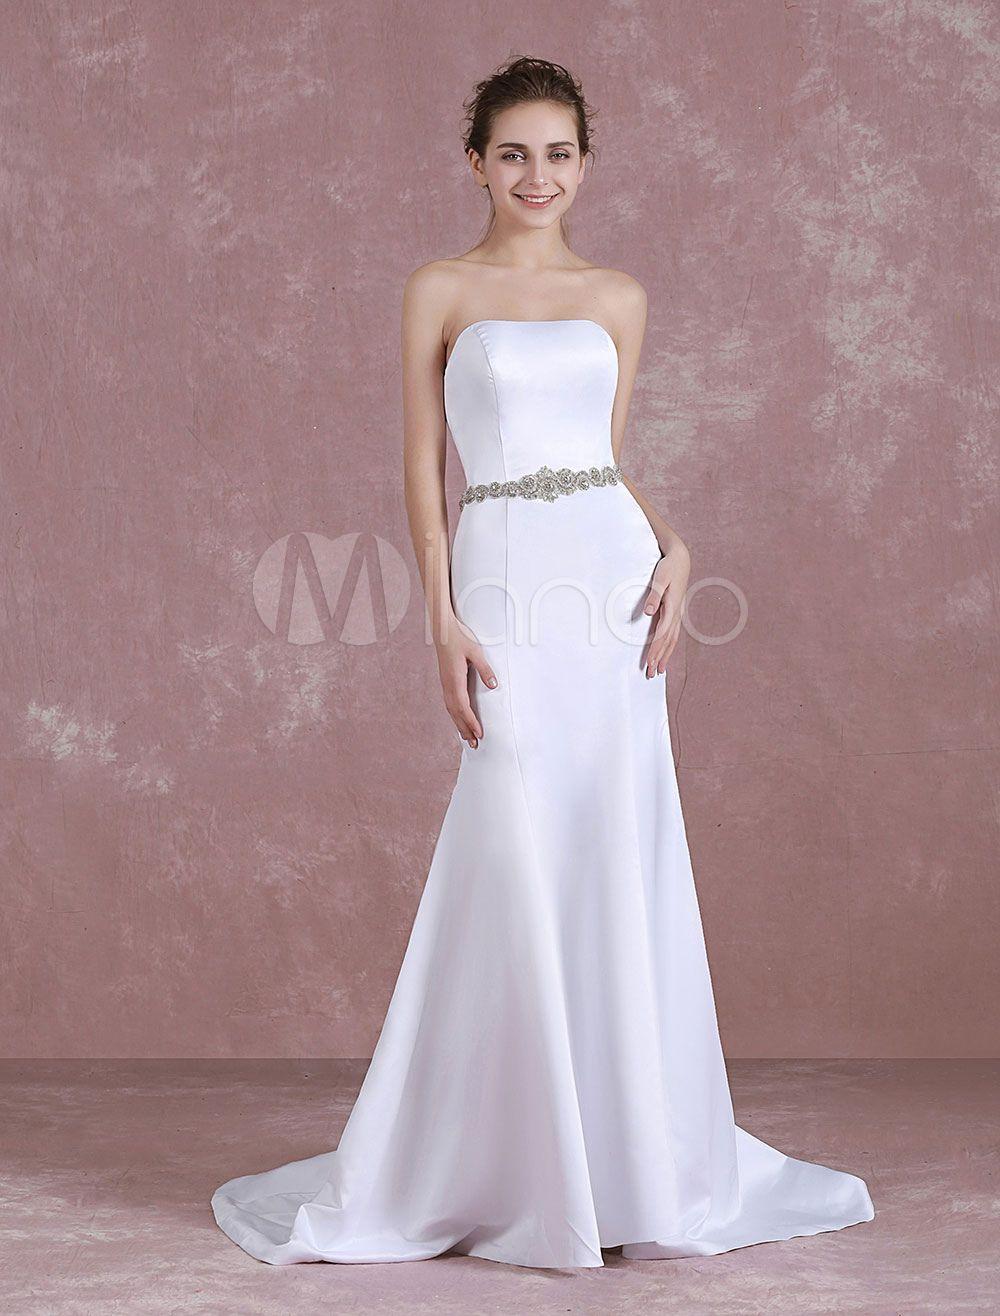 Summer wedding dresses mermaid satin strapless white bridal